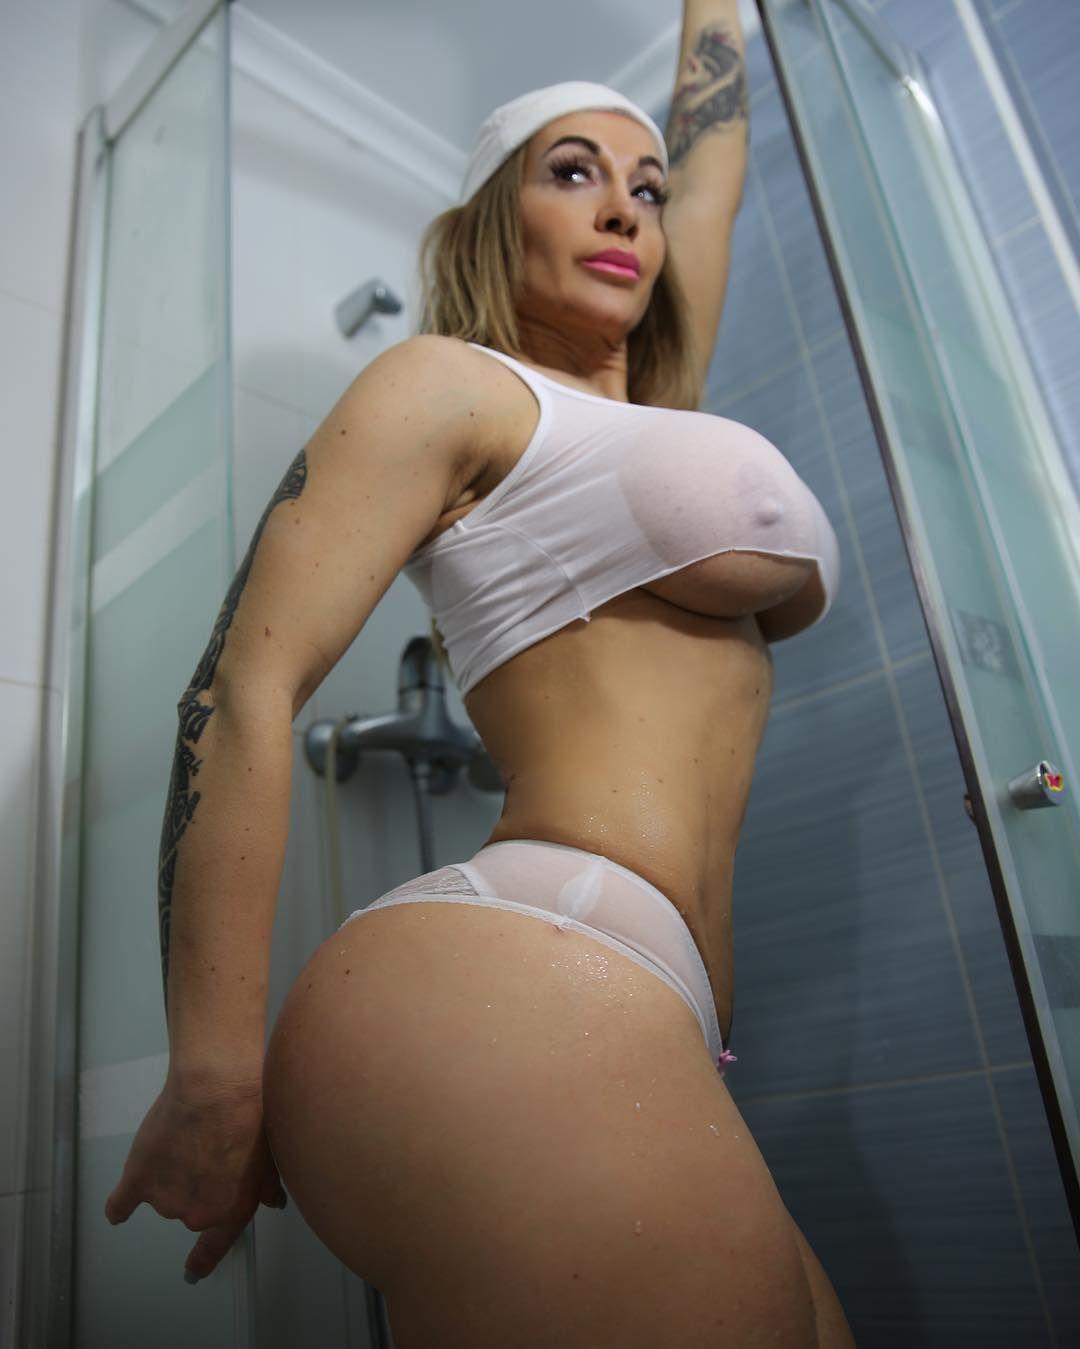 Mini Model Nude Fashion Link